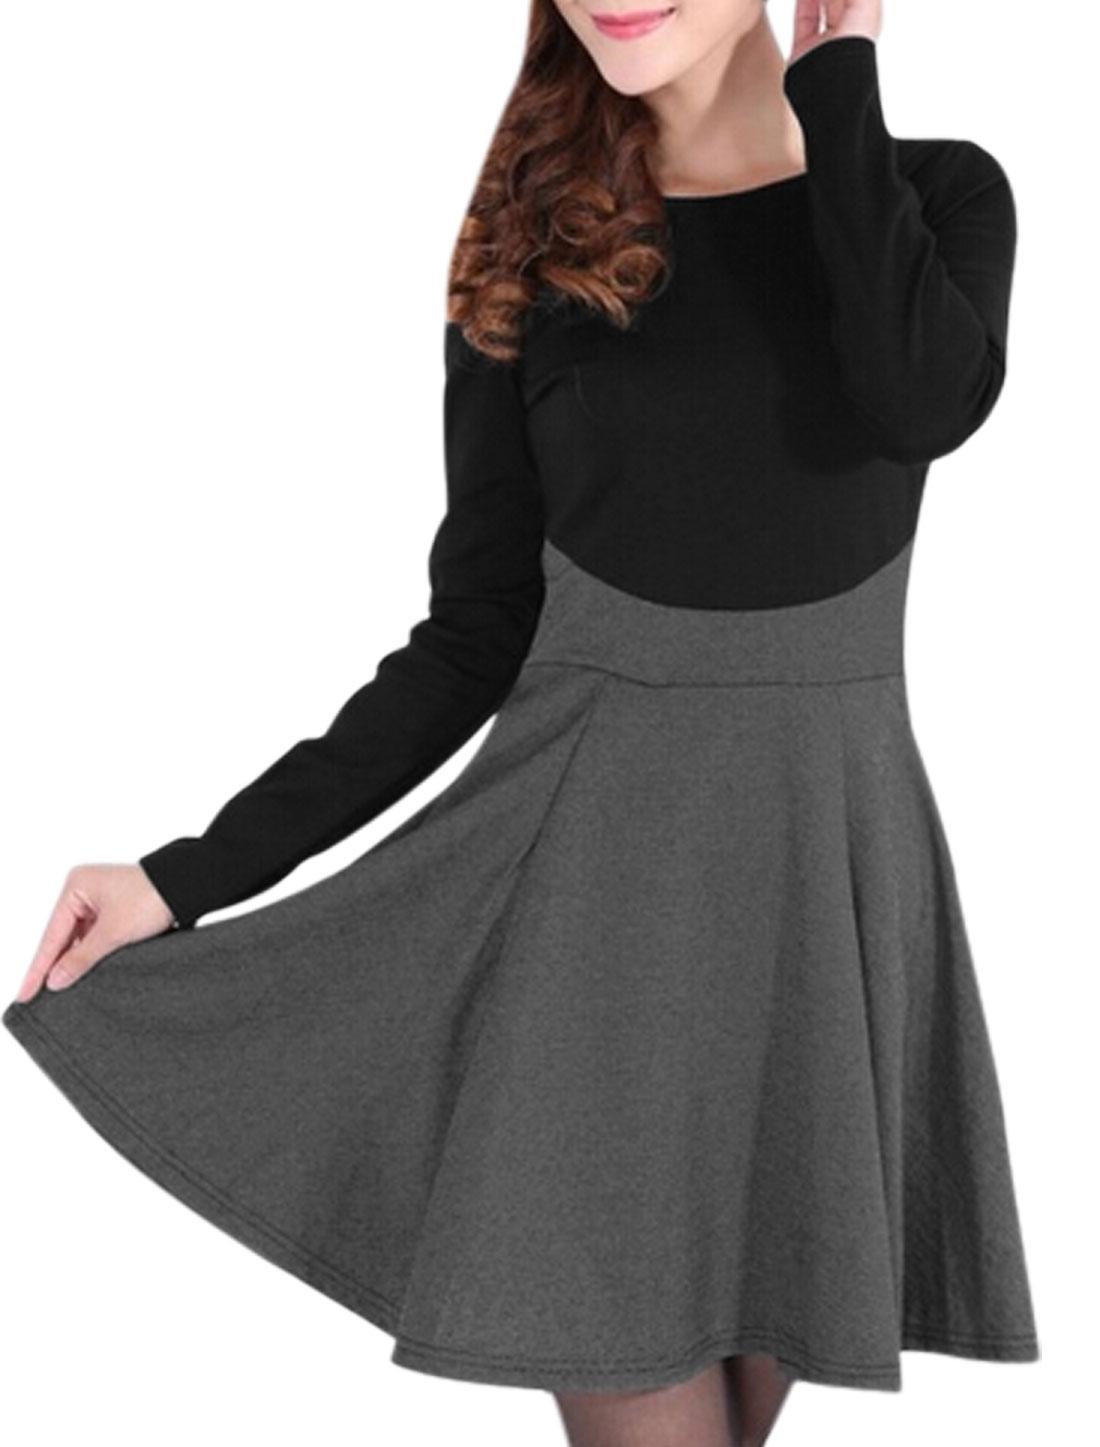 Women Round Neck Long Sleeve Color Block Short Dress Dark Gray Black S